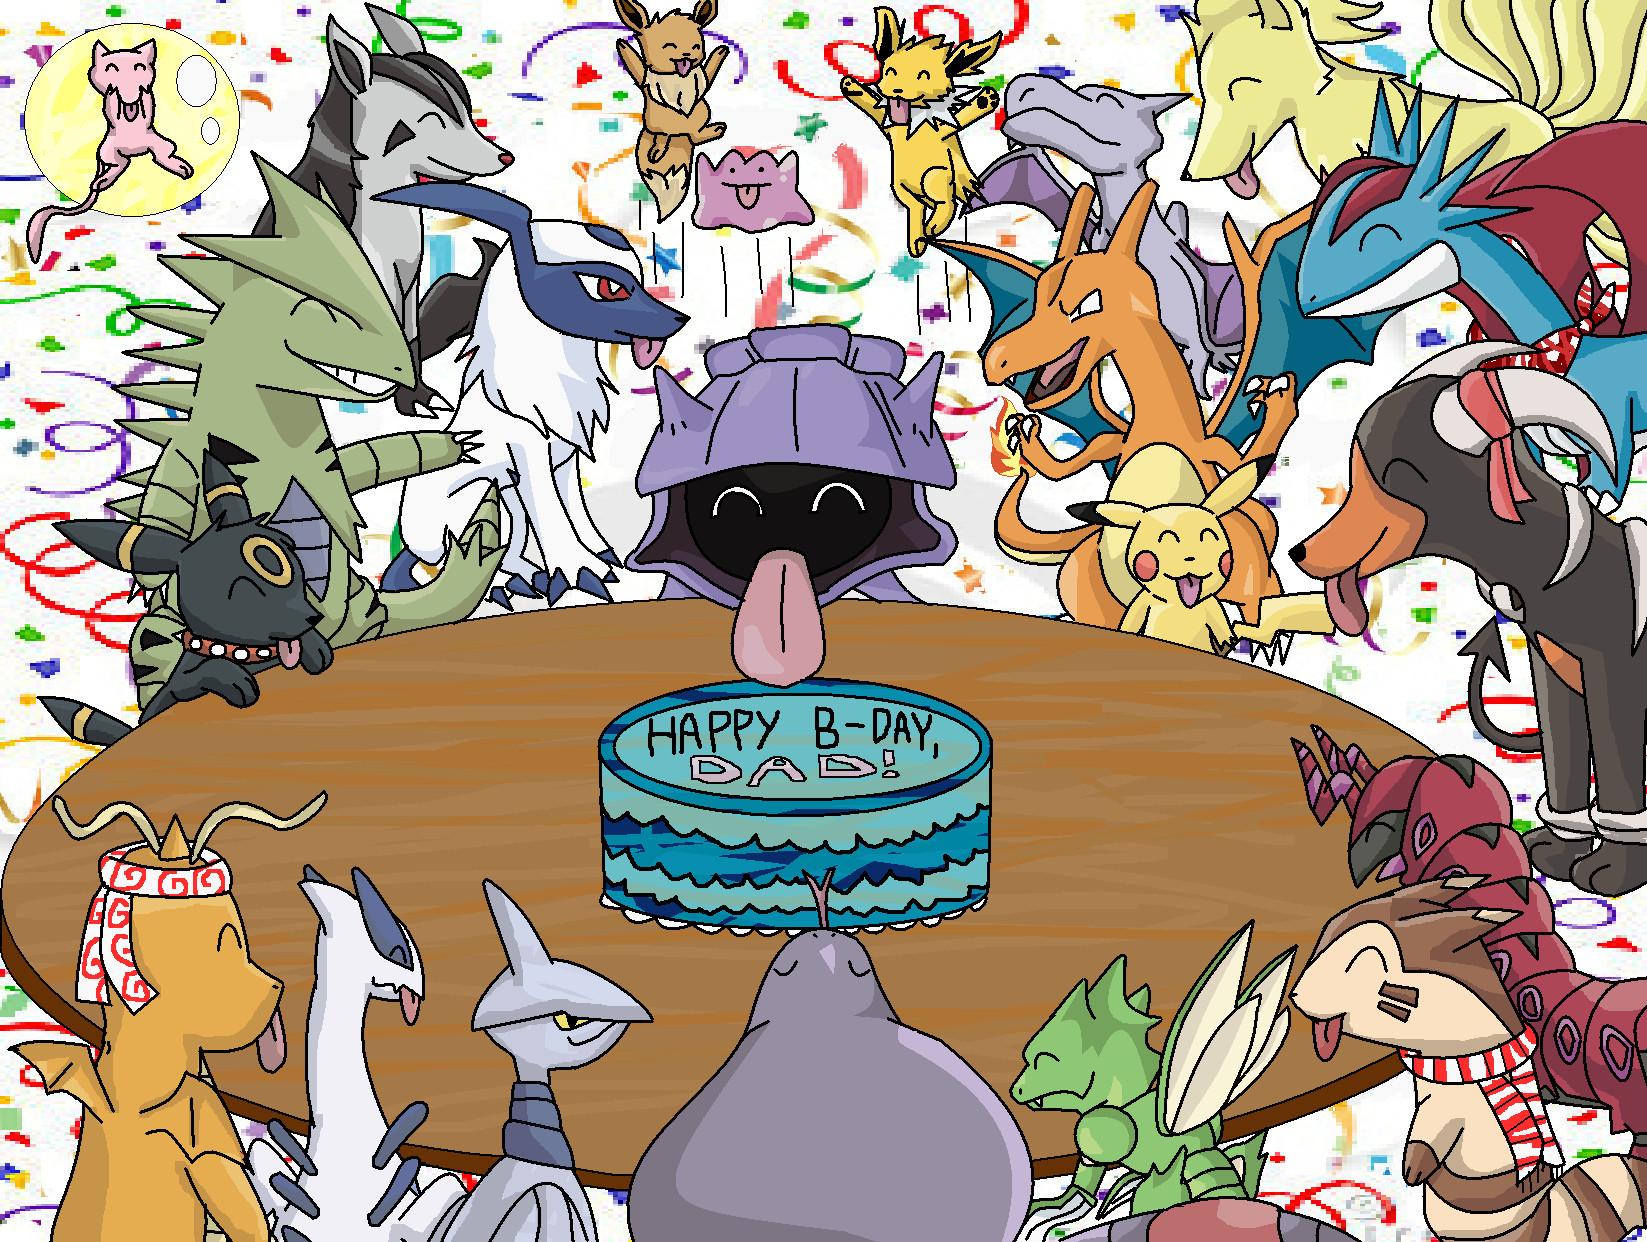 Pokemon Birthday Party by SalamencePaint on DeviantArt